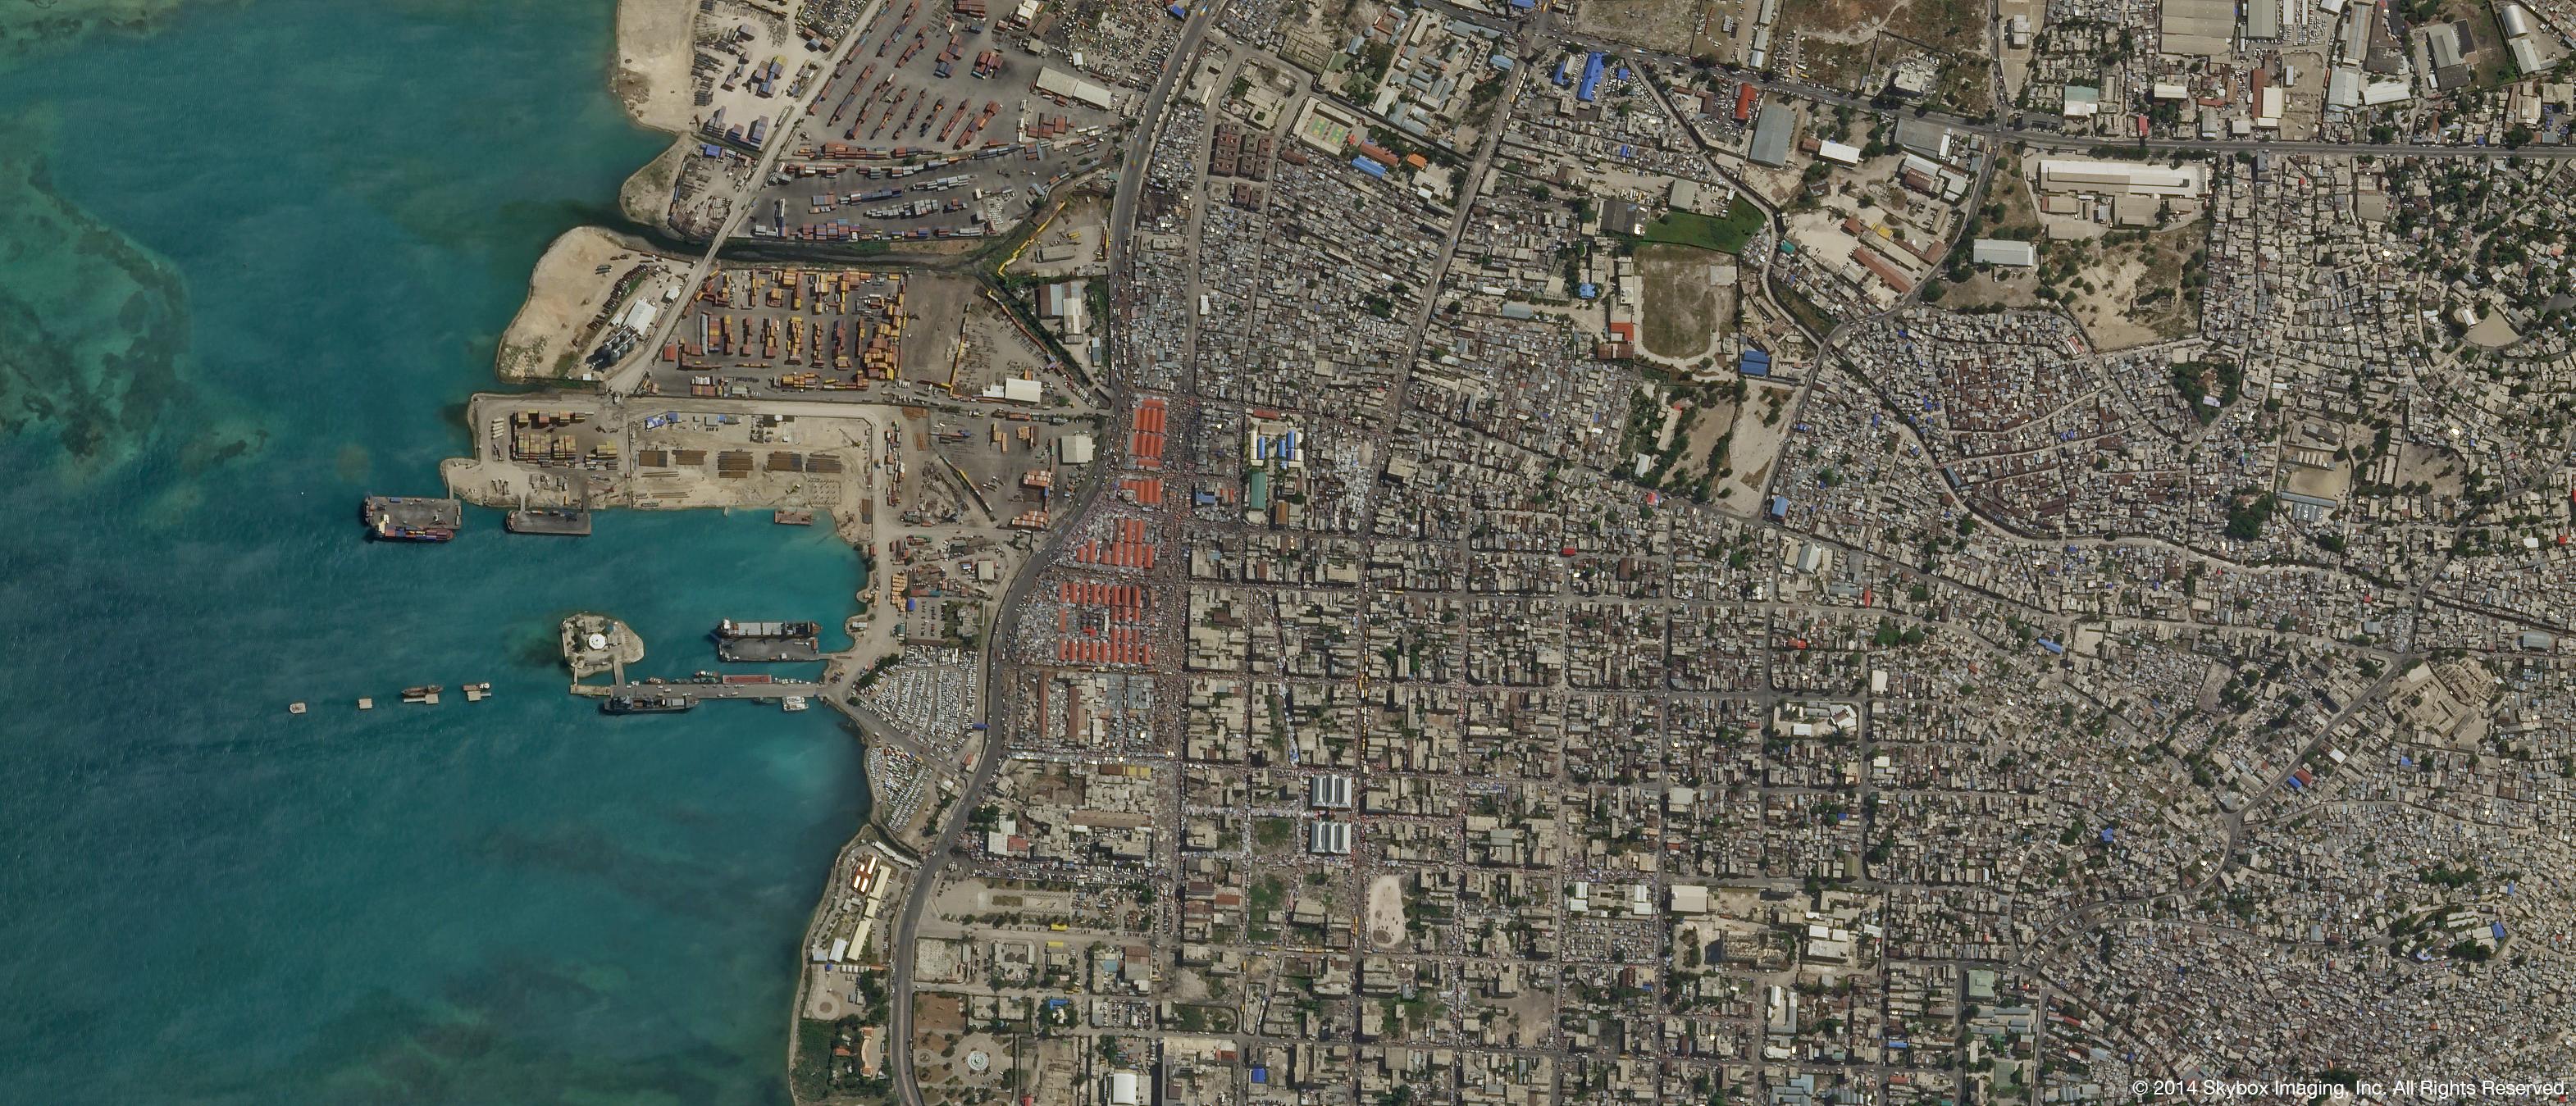 Emerging Paris Port Au Prince Programs Kvazarinfo - Vol paris port au prince